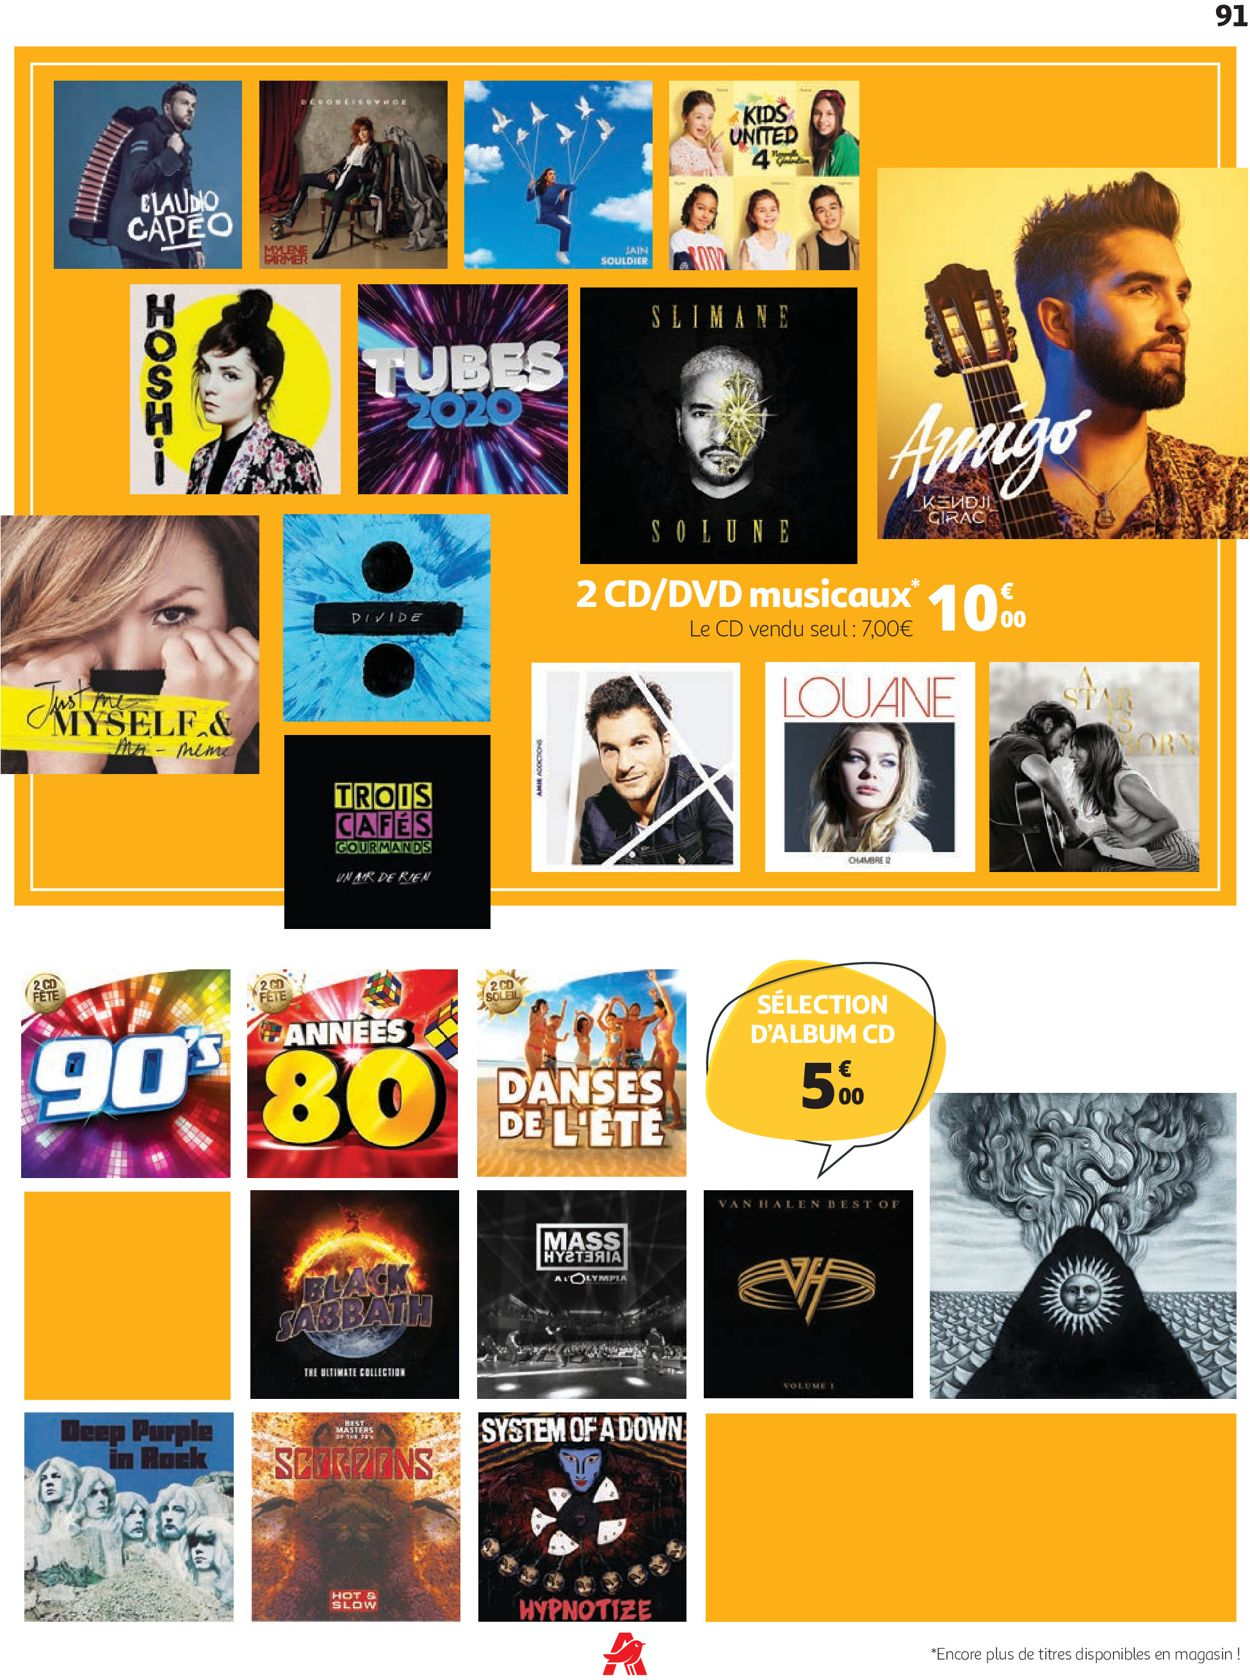 Auchan Catalogue - 04.07-30.08.2020 (Page 91)